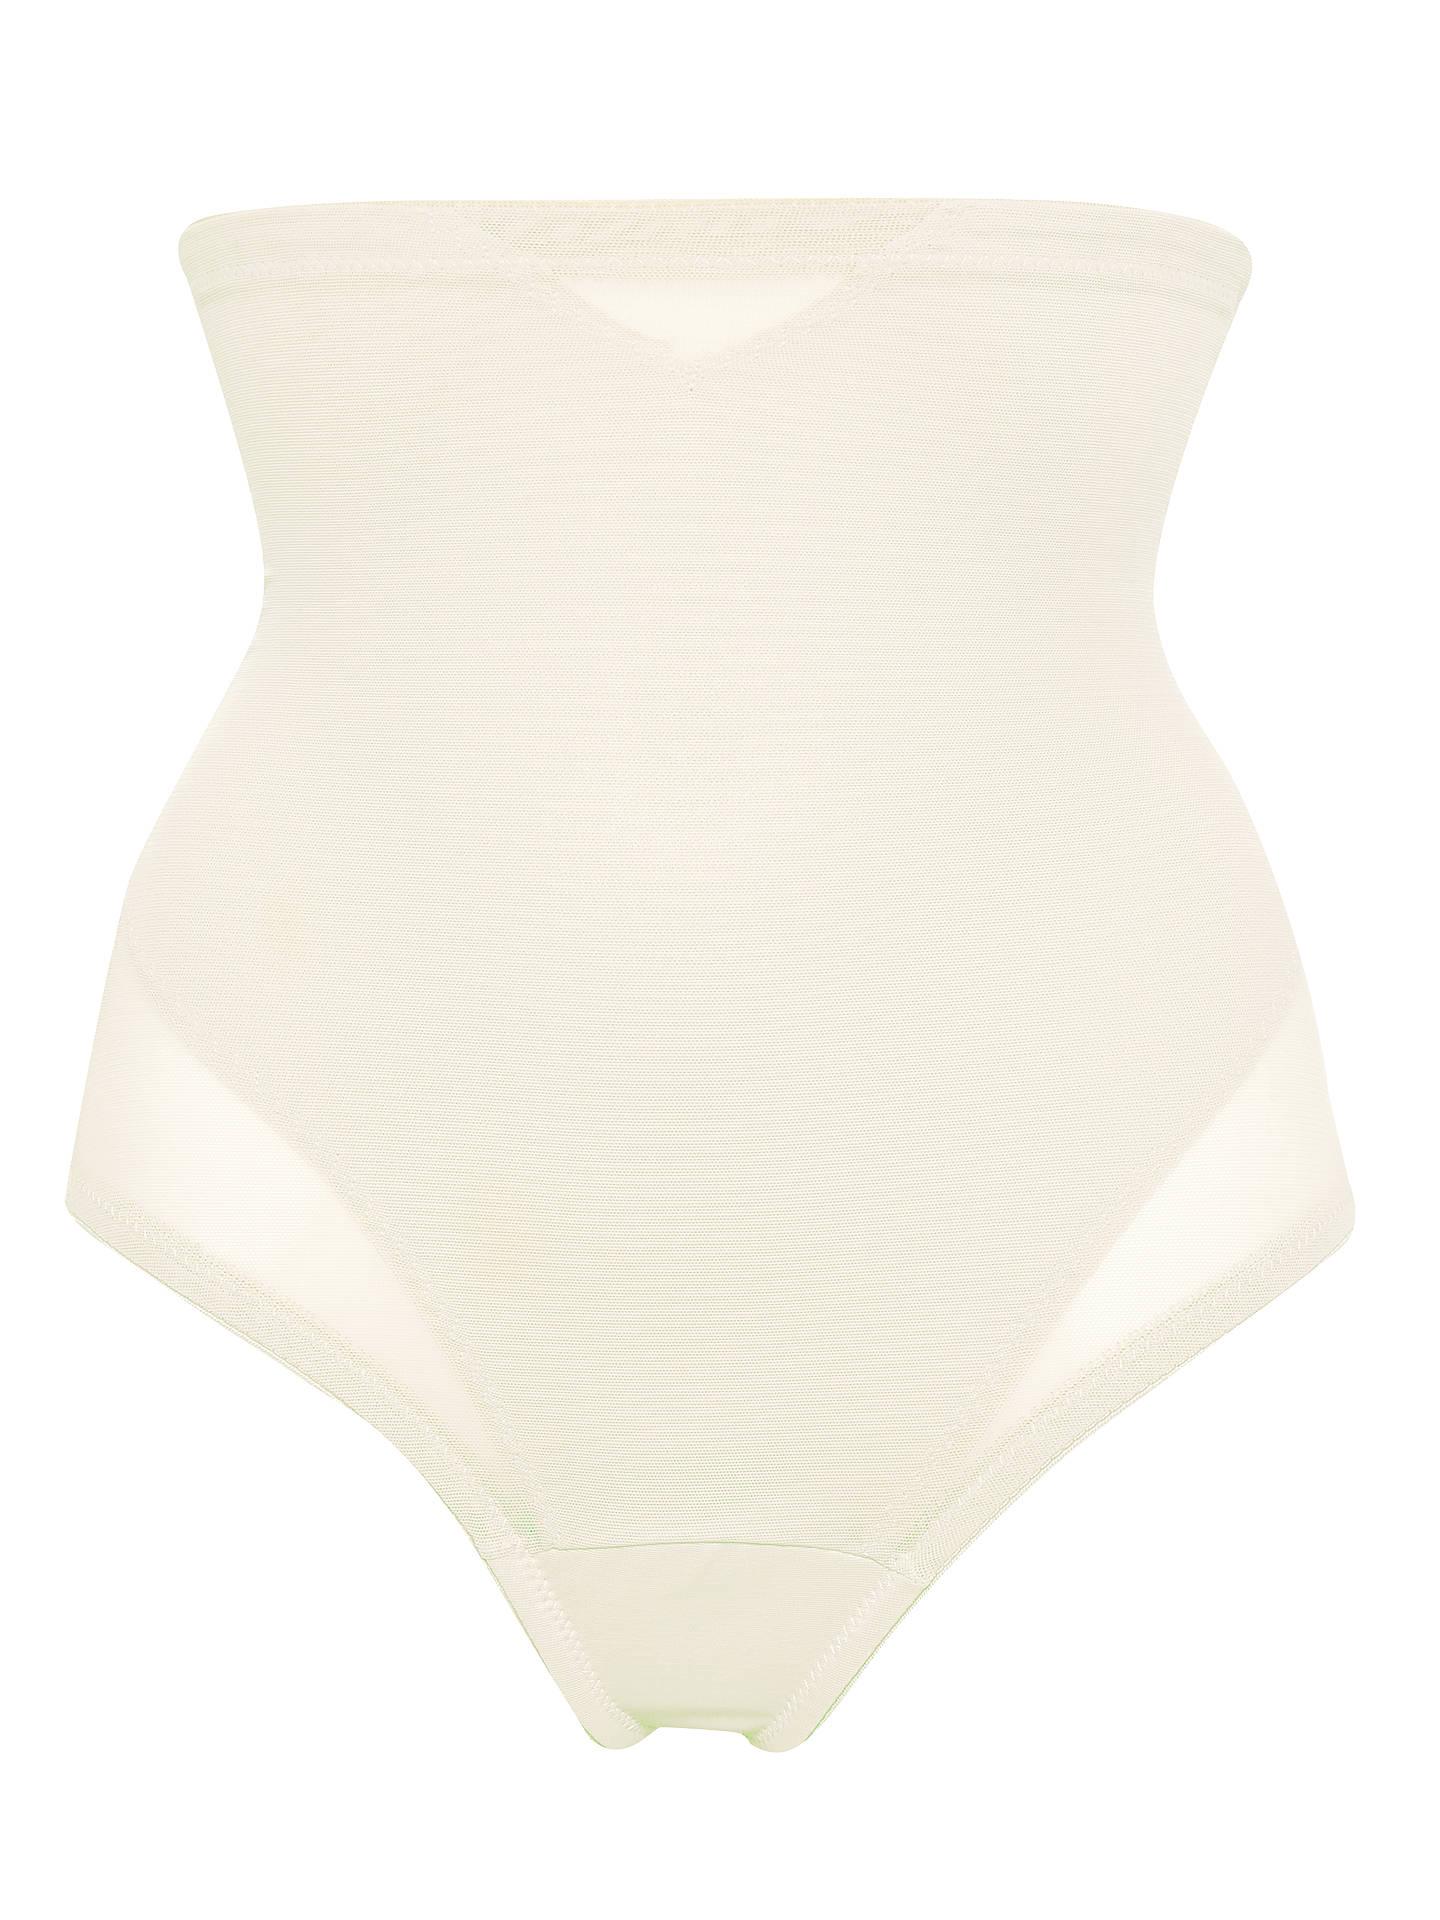 S-3XL Plus Size Black/Nude Women High-Waist Tummy Control Body Shaper Thong Panty Shapewear Lady